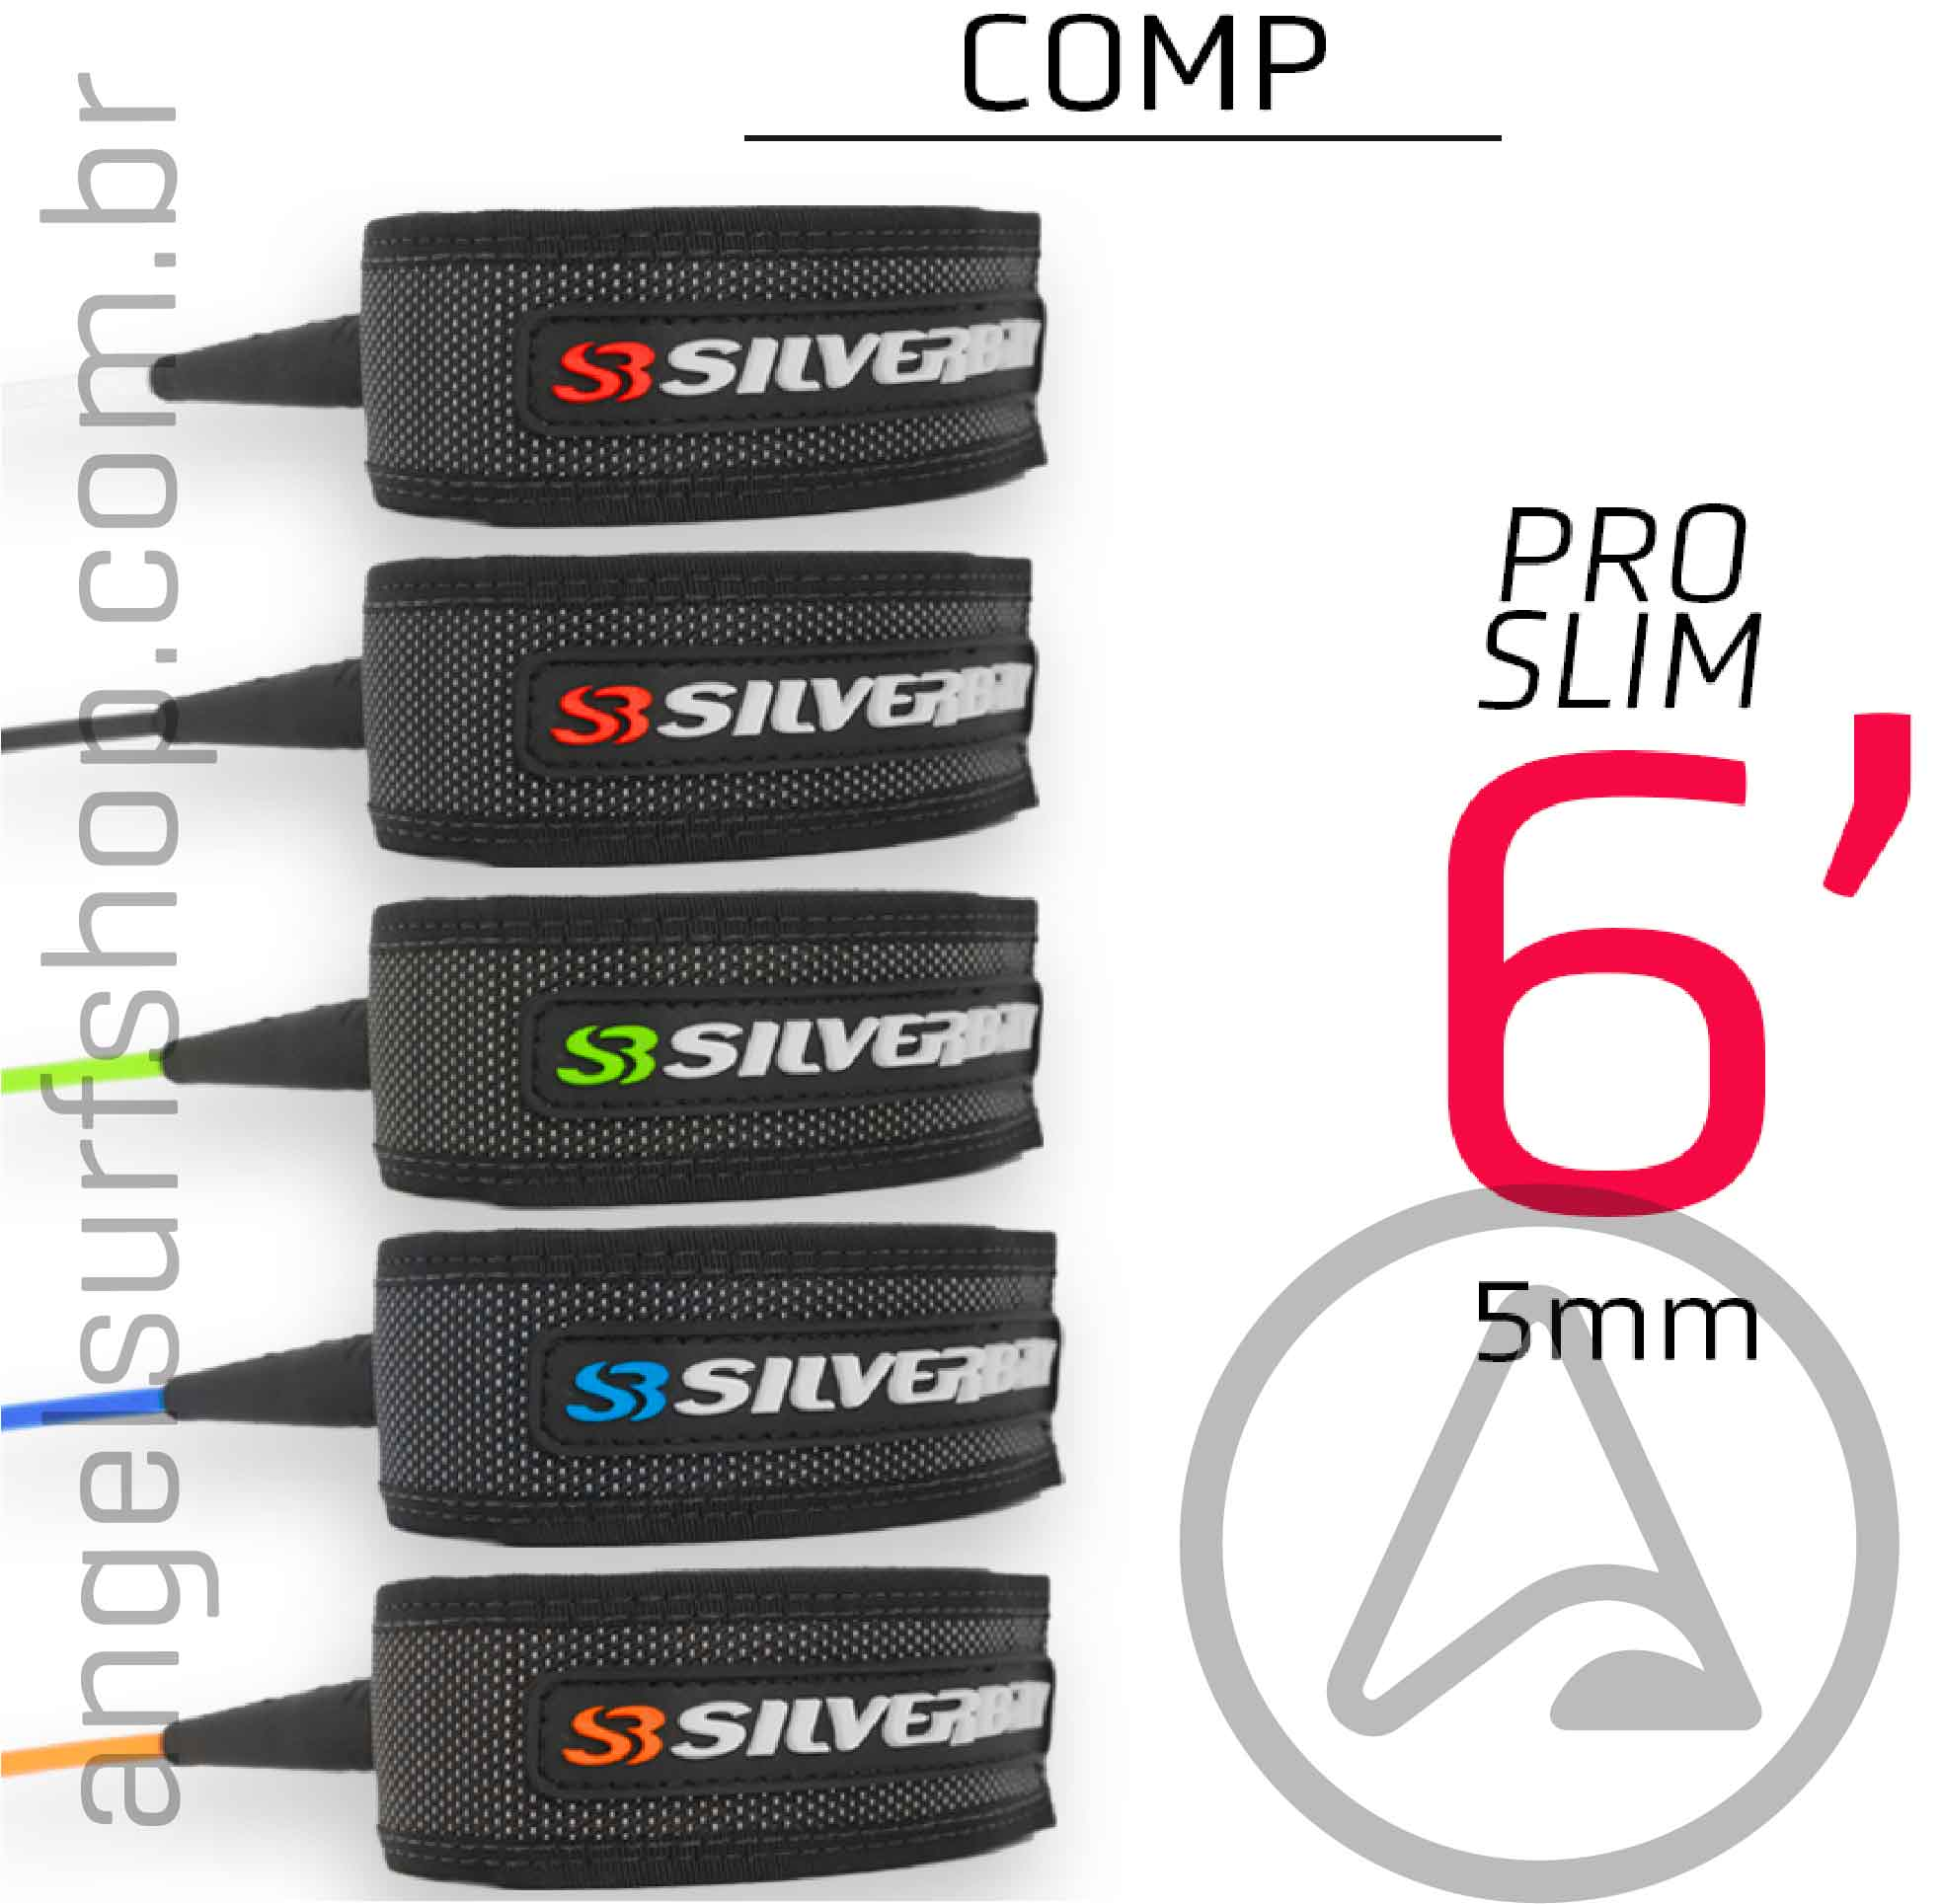 Leash SILVERBAY PRO SLIM COMP 6x5mm